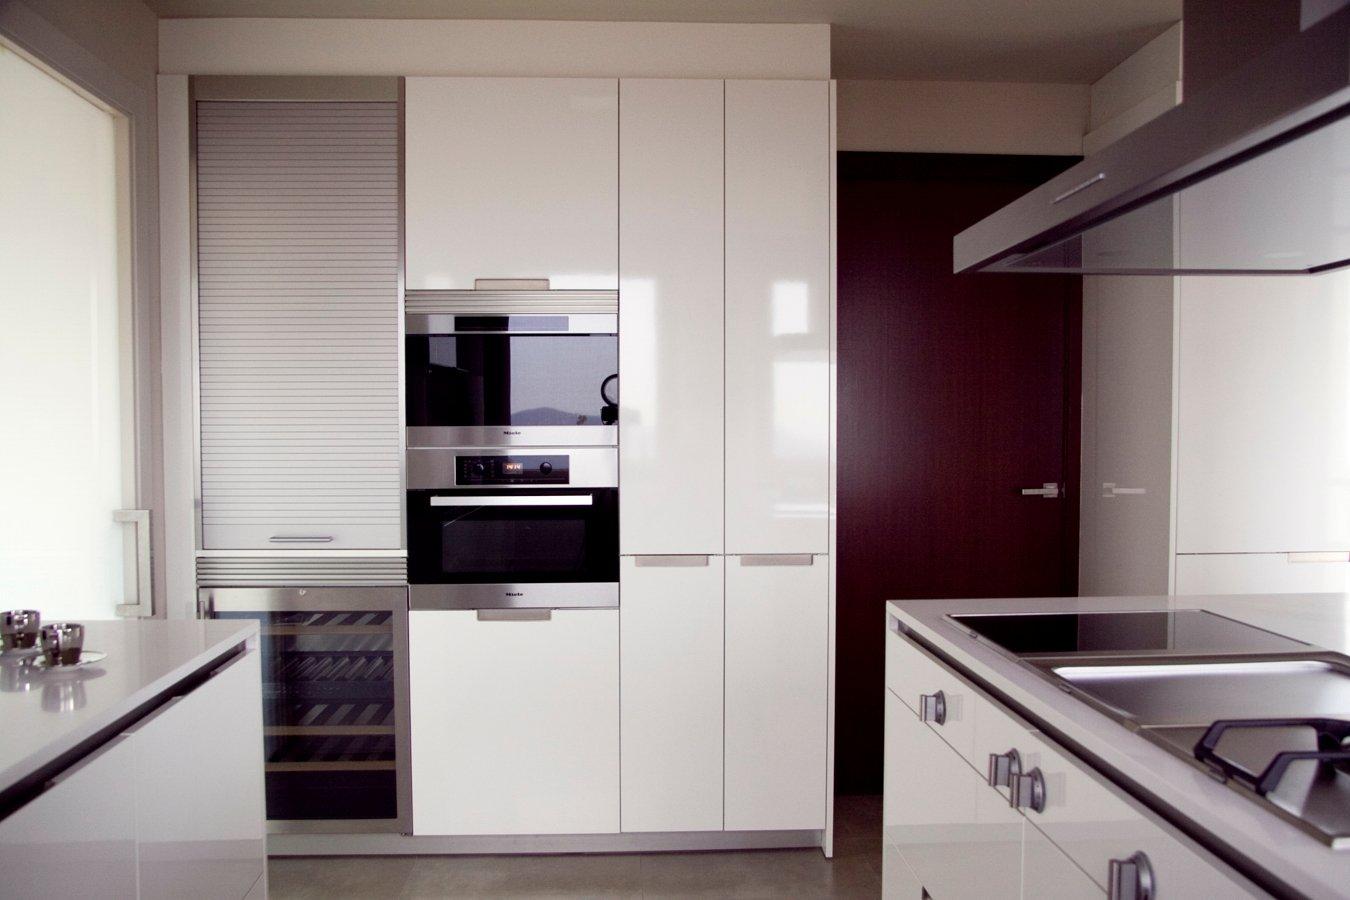 Perfecto Precio Cocinas Santos Modelo - Ideas de Decoración de ...